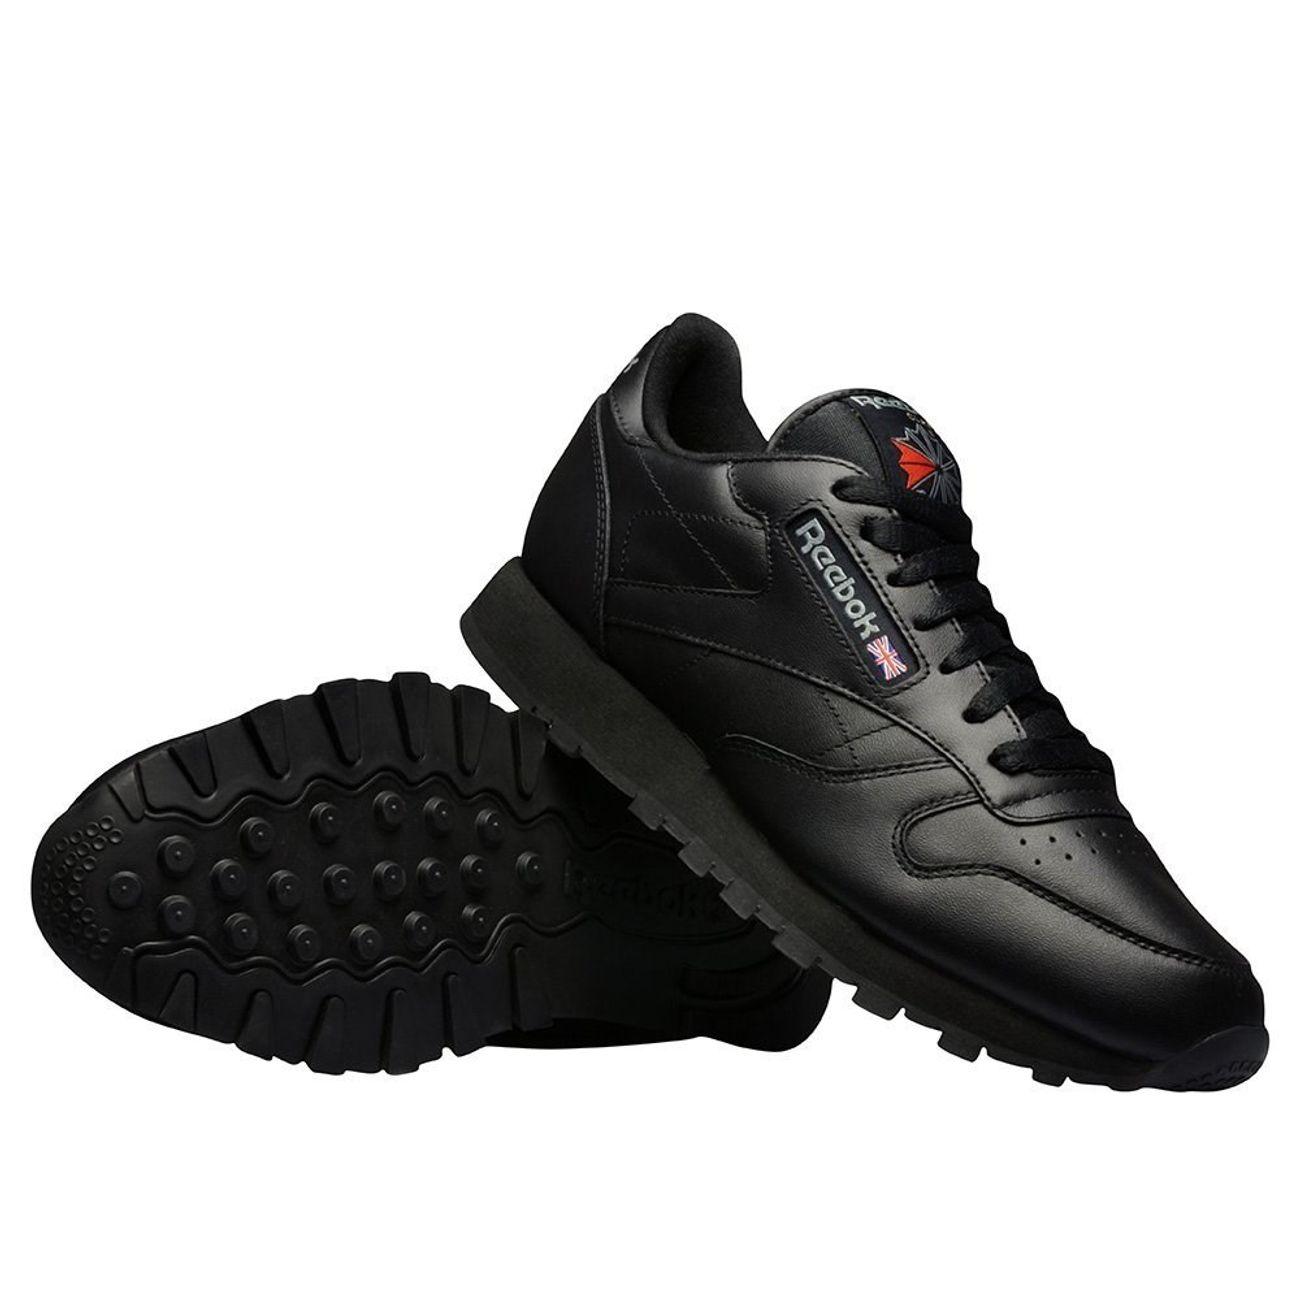 11344c696865f ... Mode- Lifestyle homme REEBOK Reebok Classic Leather noir